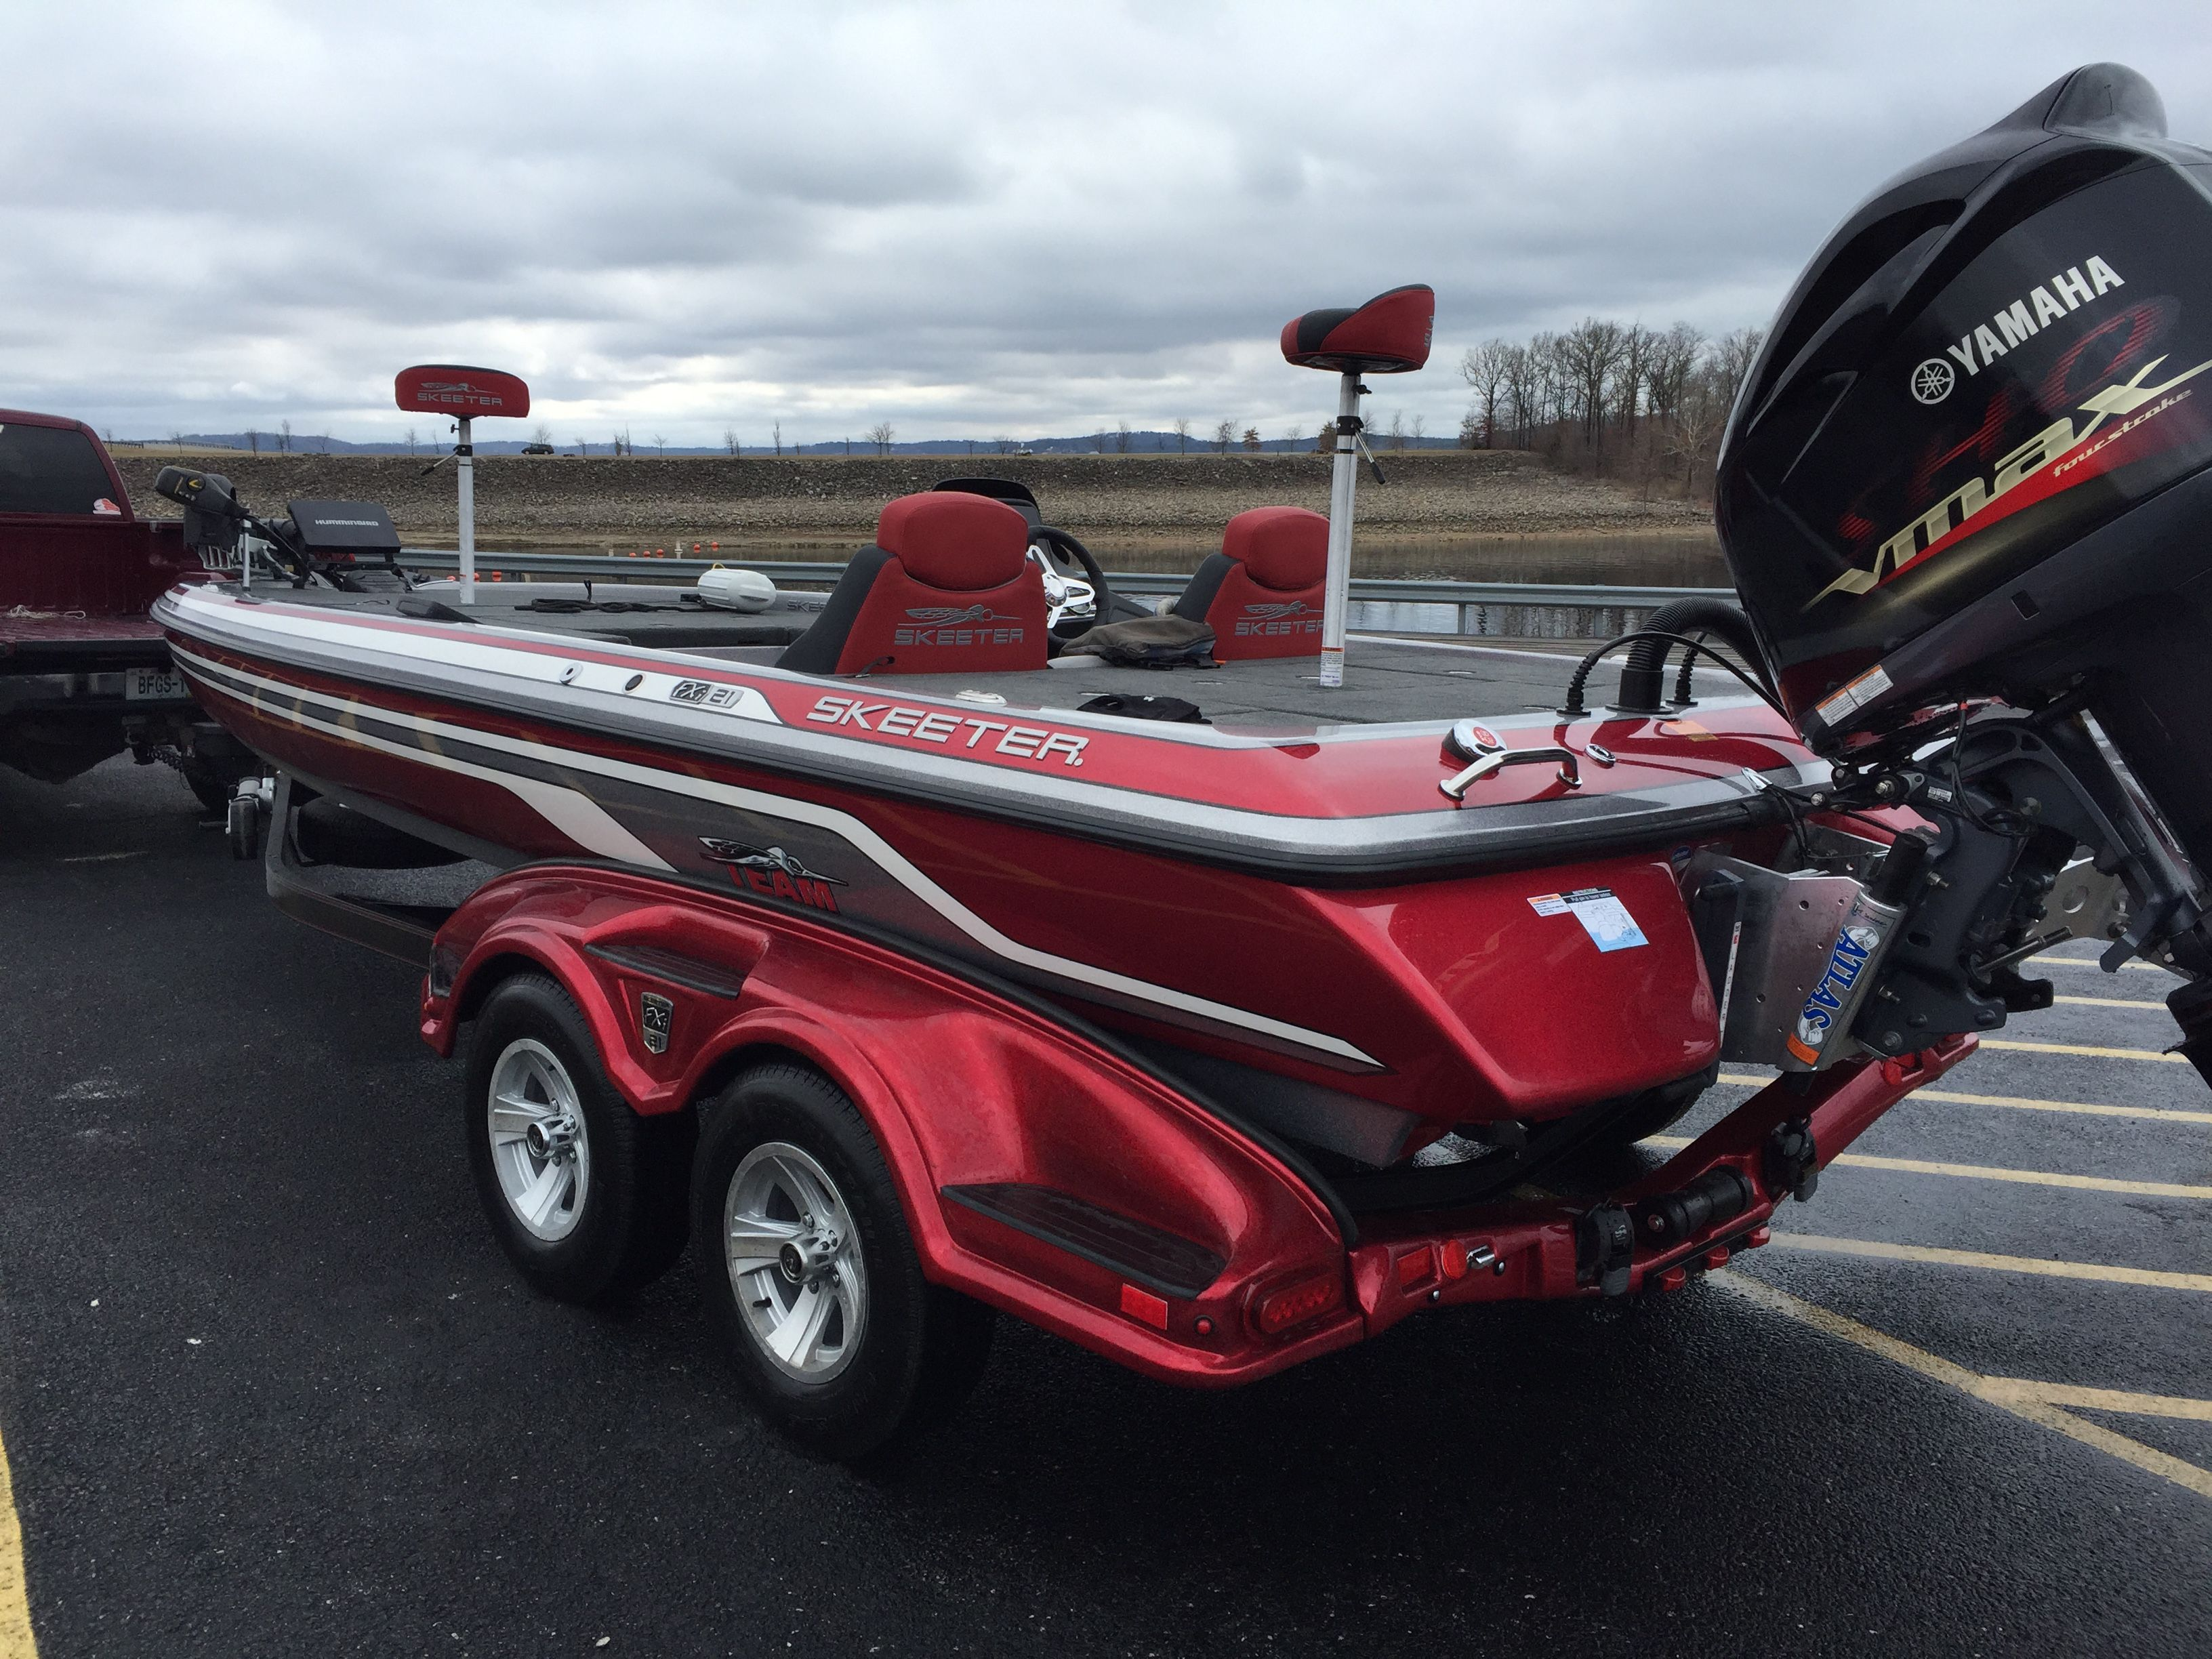 2015 Skeeter Fxi 21 Bass Boat Bass Boat Bass Fishing Boats Lake Fishing